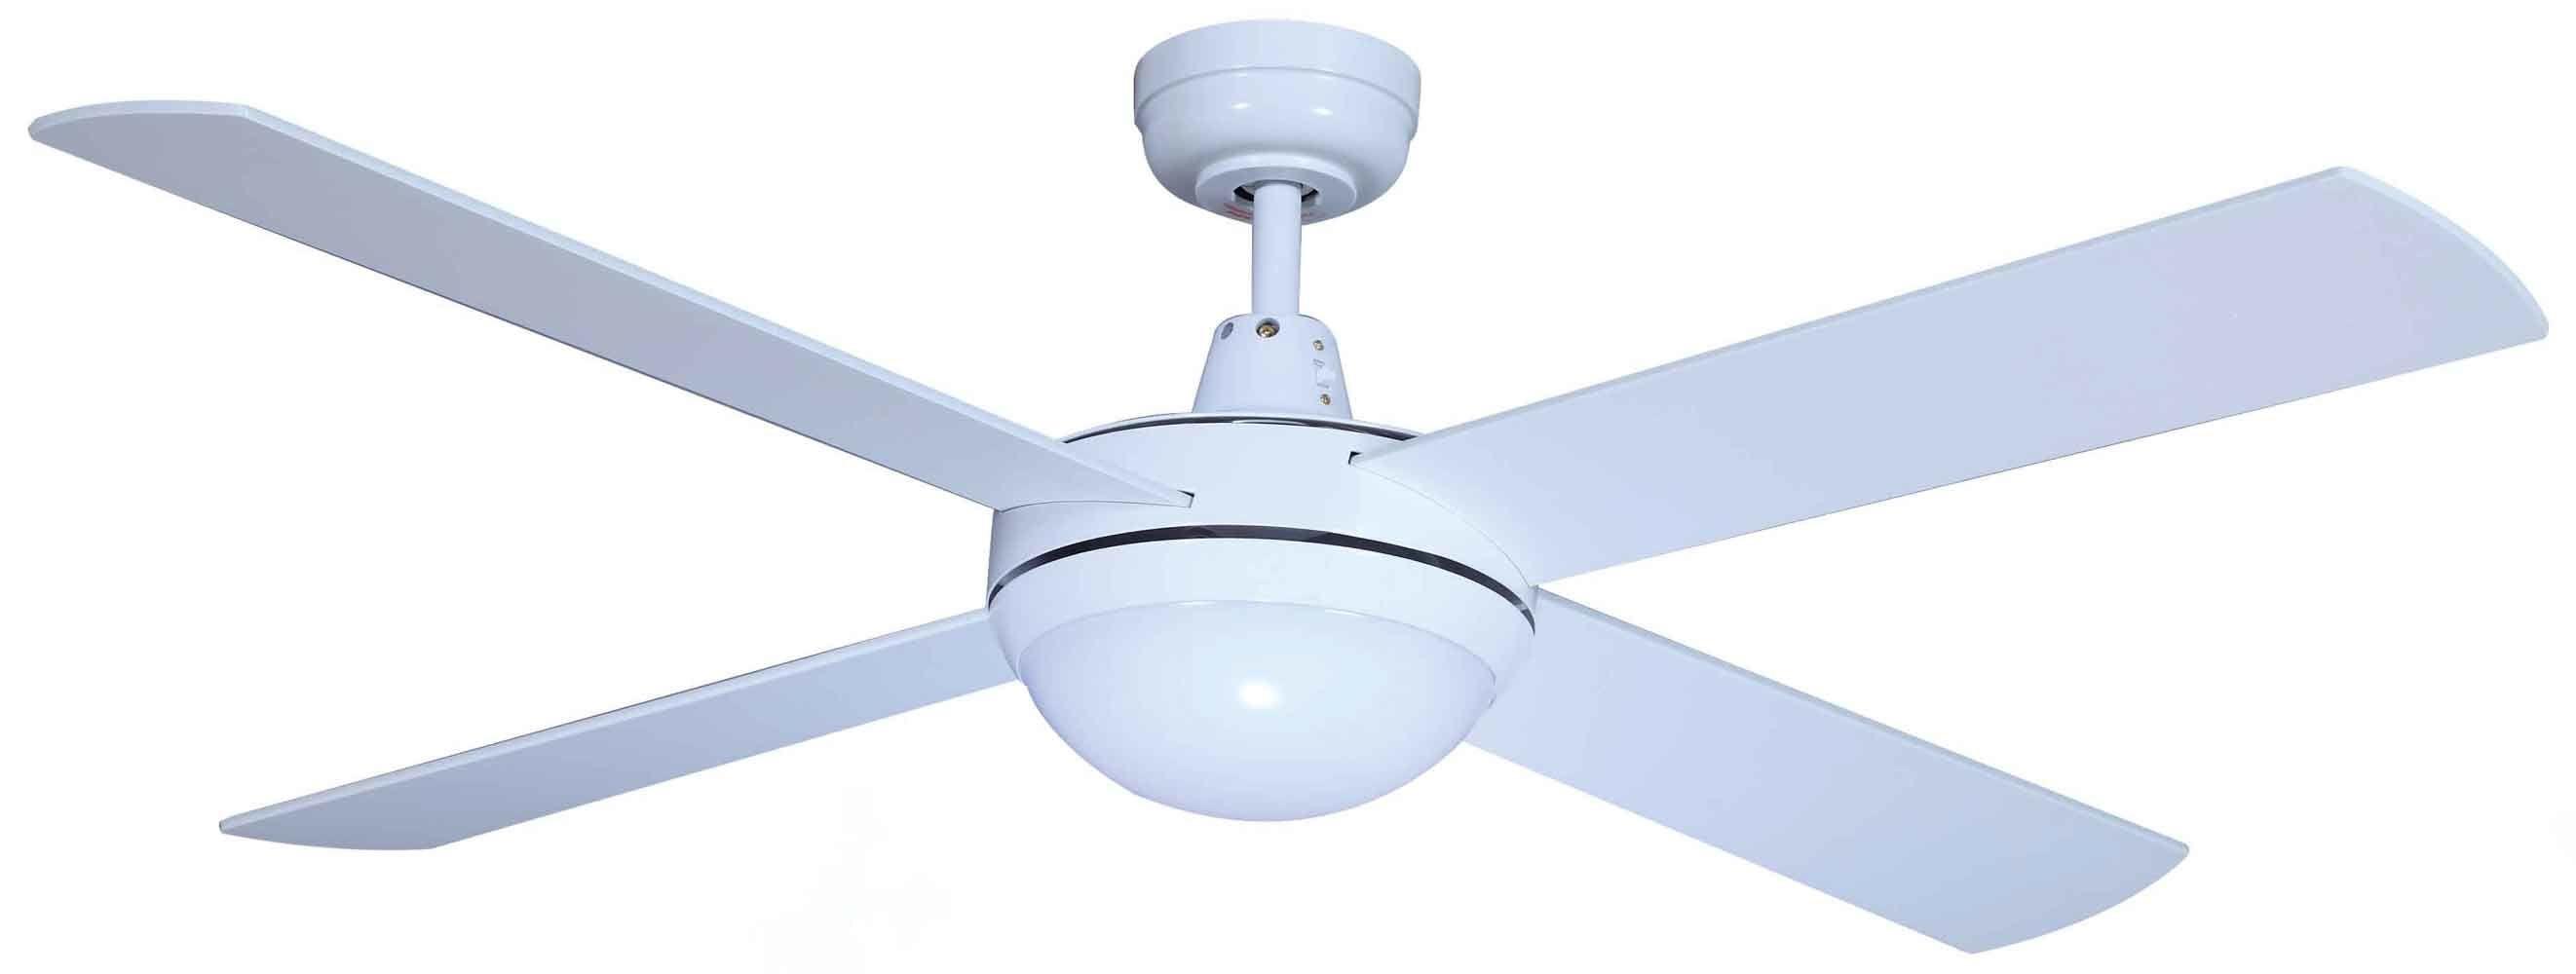 led picture fans smart ceilings lights automatic dusk sensor dawn of s bulbs minger lamps for ceiling p